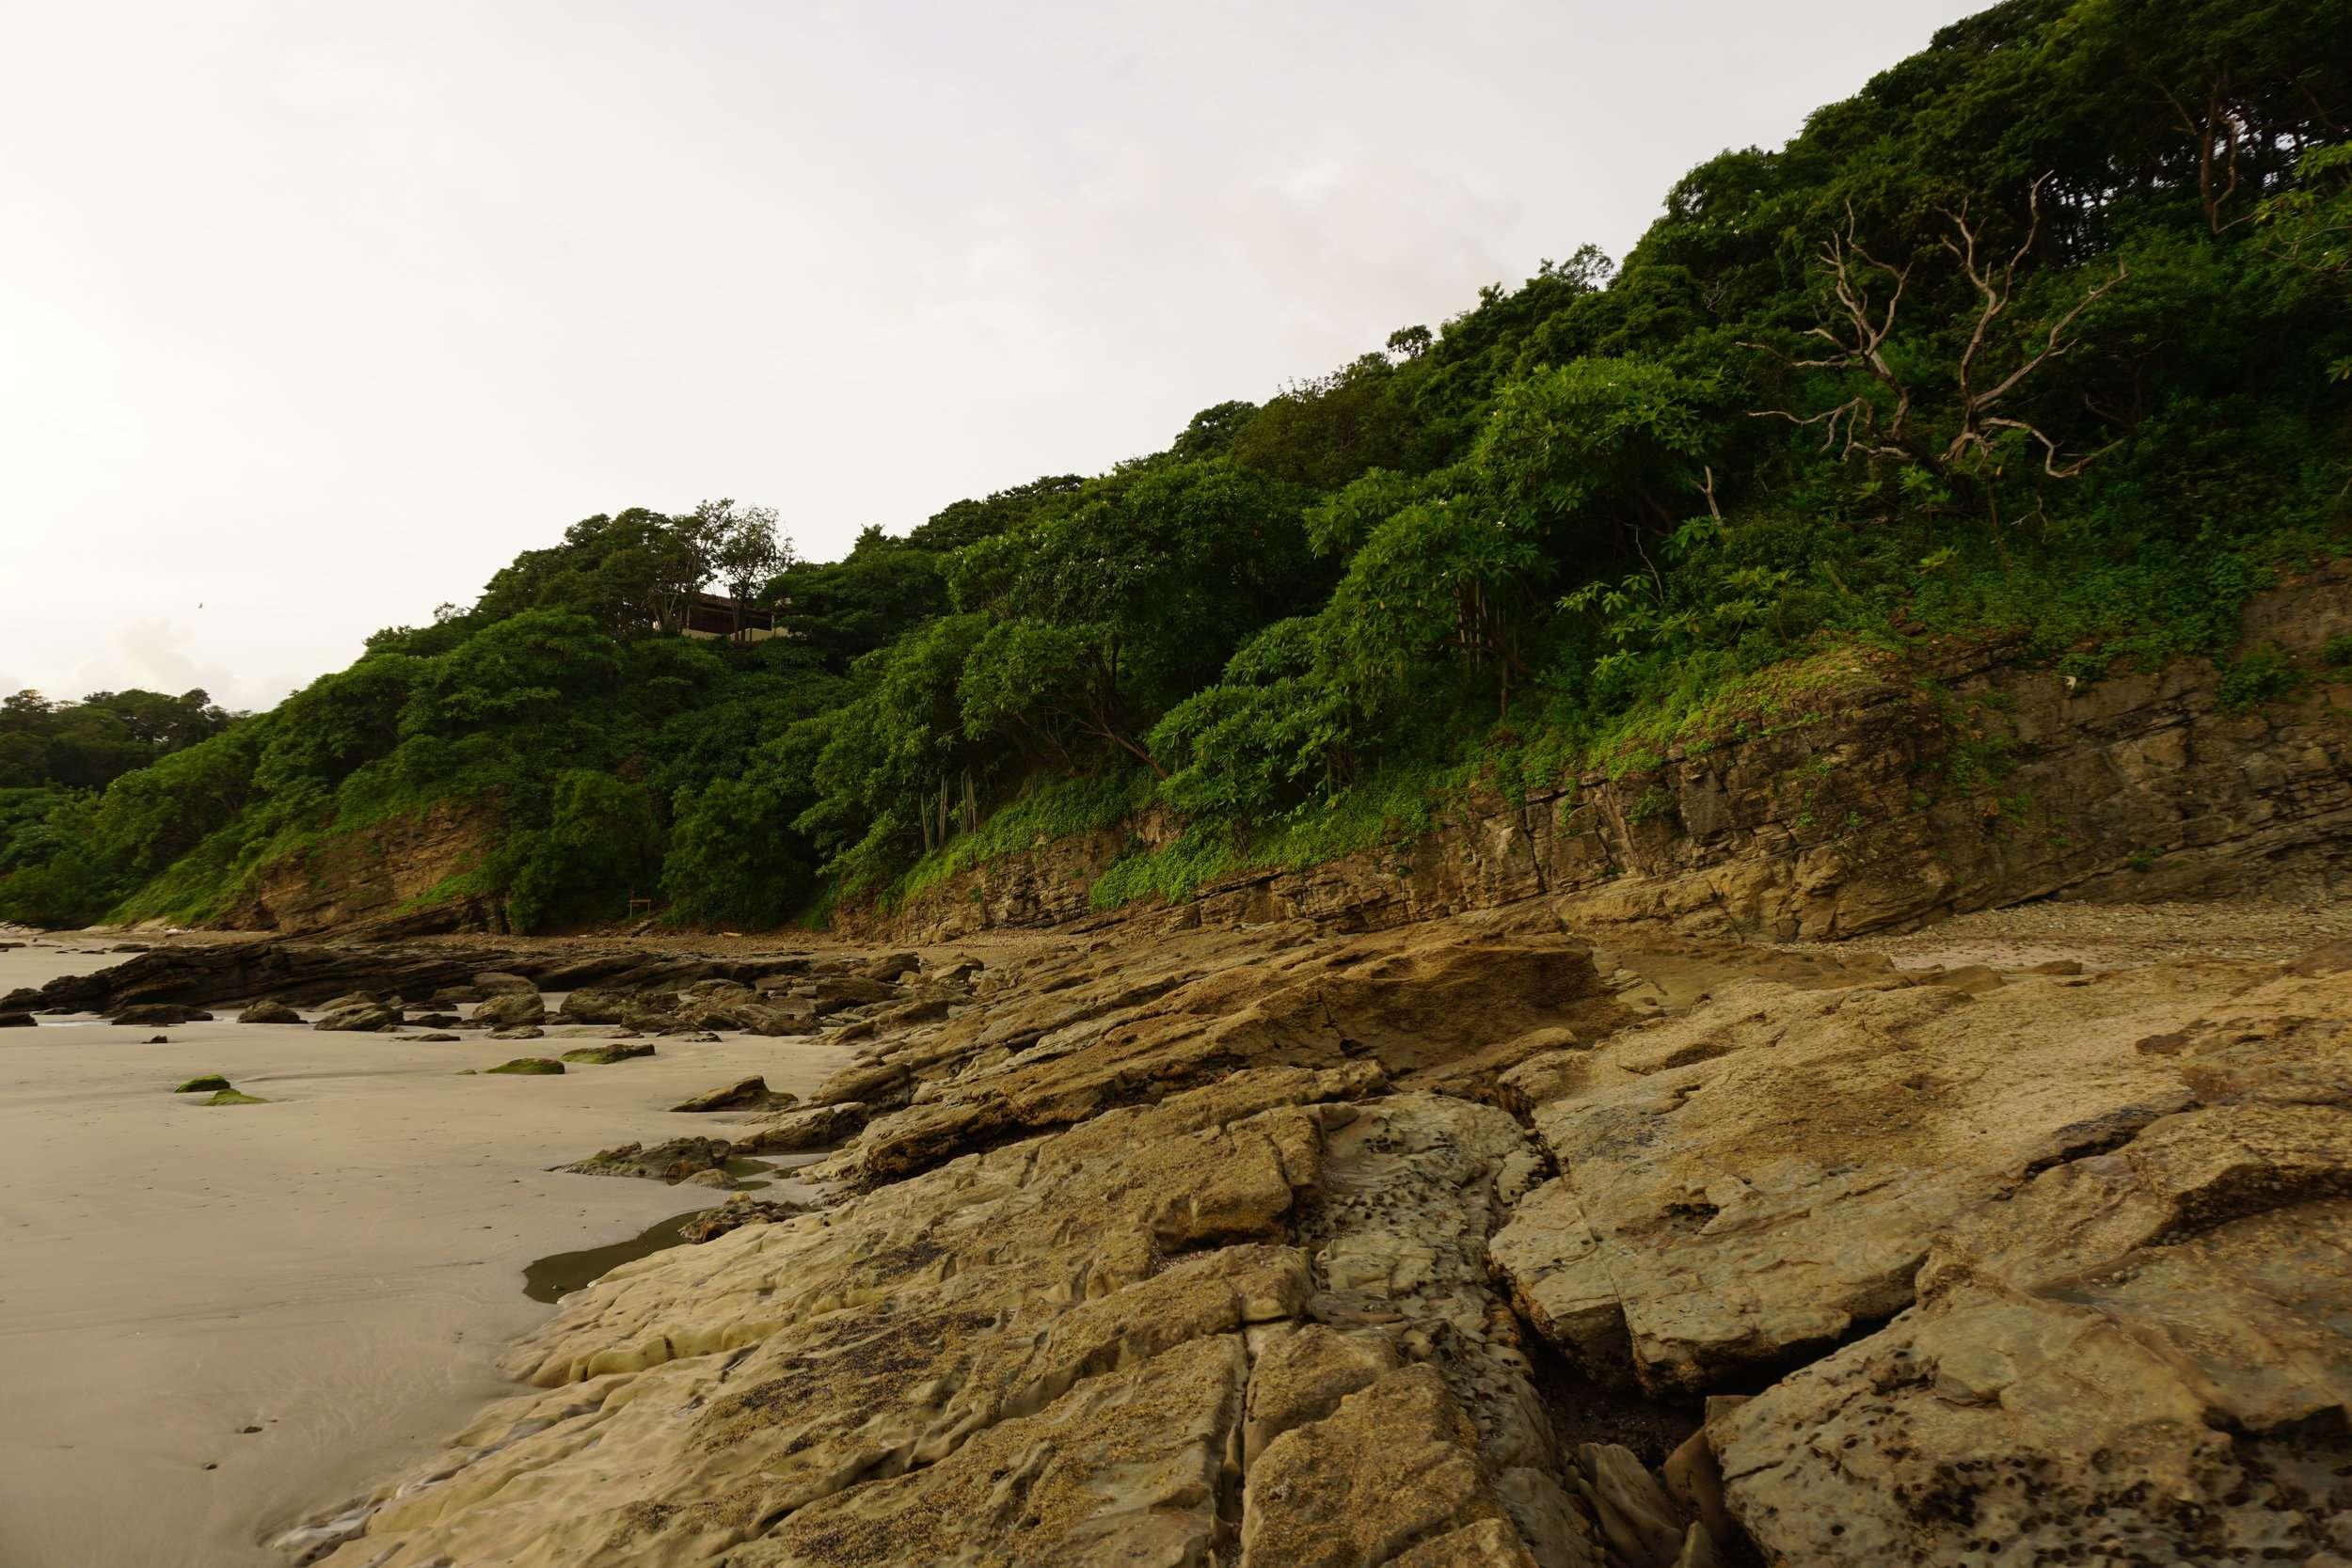 Rugged pacific coast line at Playa Maderas, Nicaragua